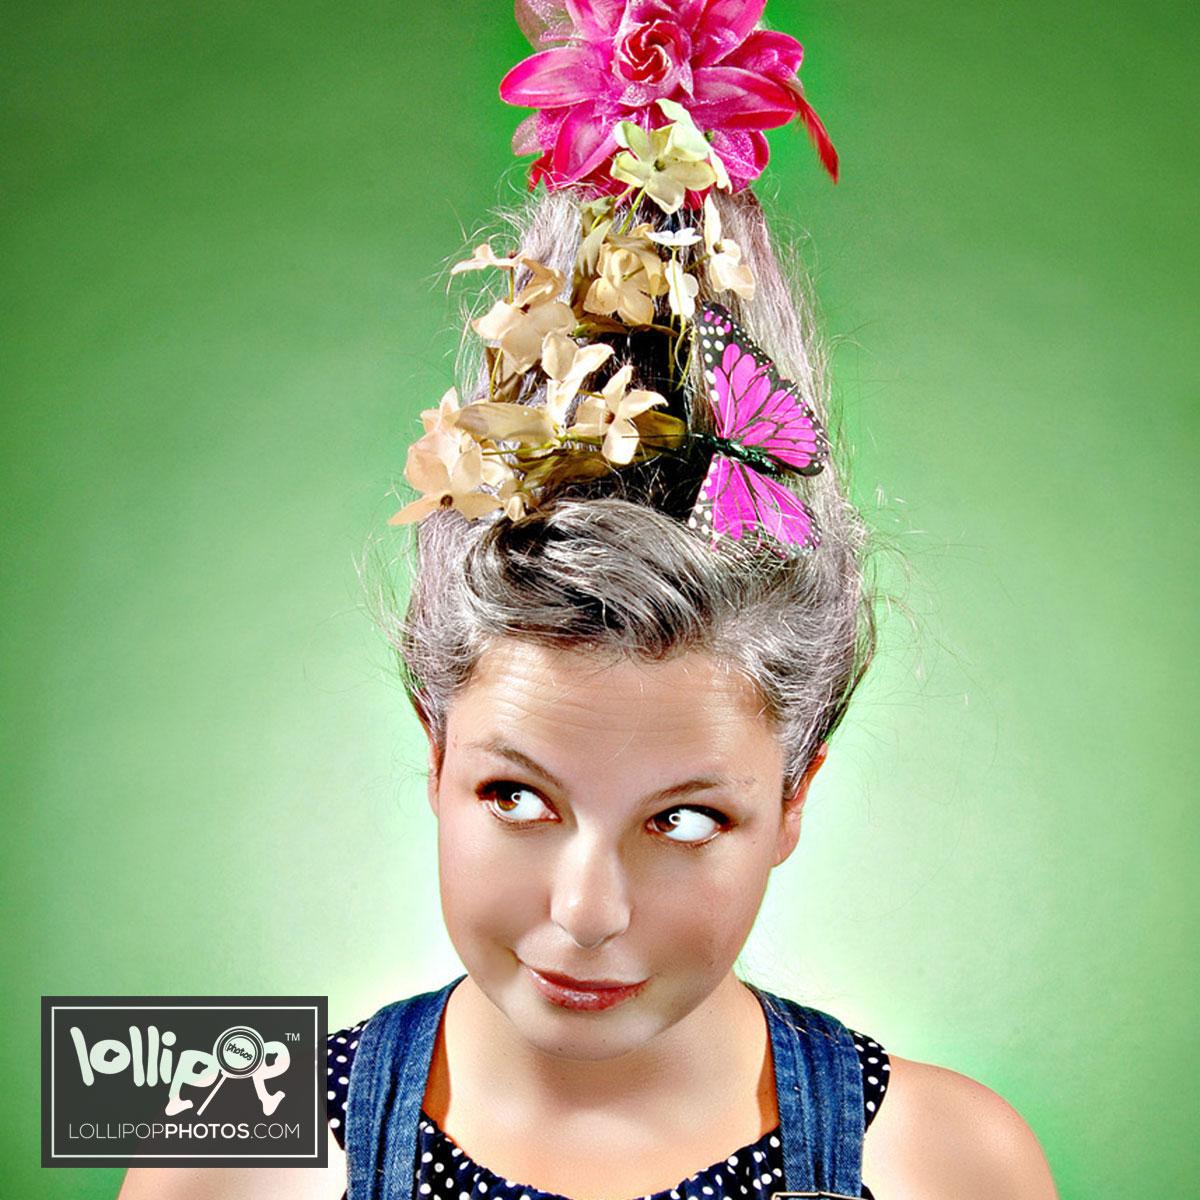 msdig-nora-canfield-lollipop-photos-440.jpg